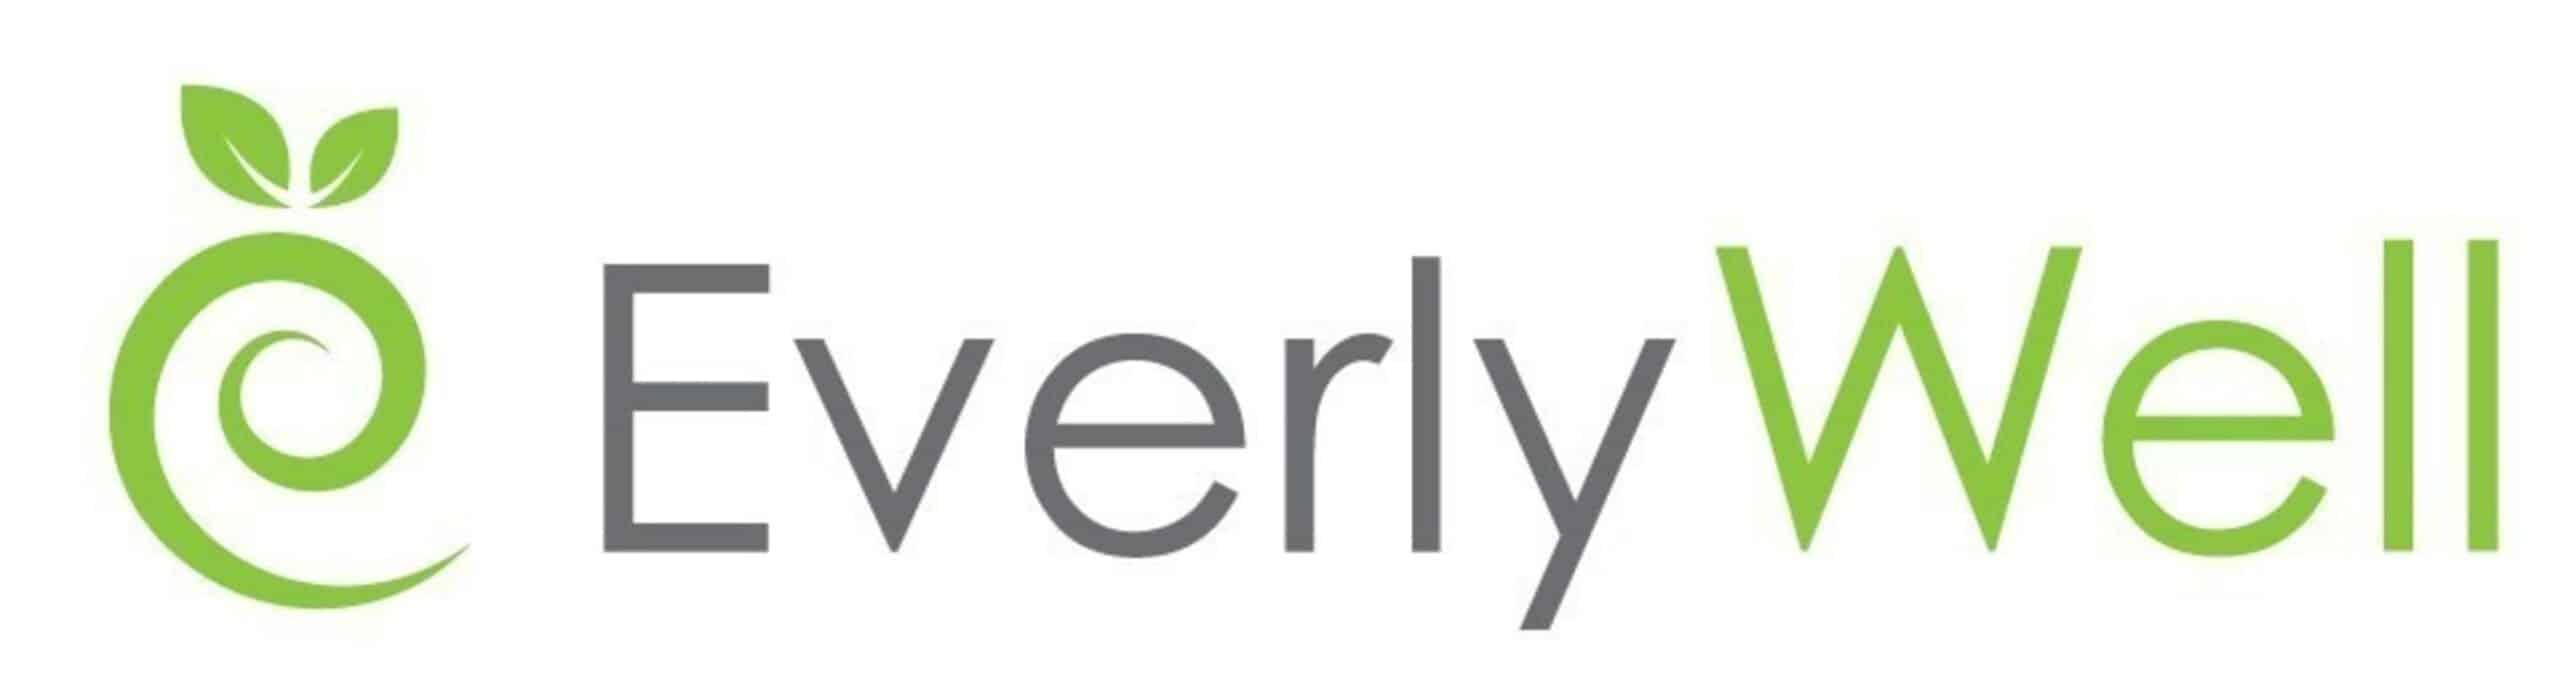 Everlywell Alternative